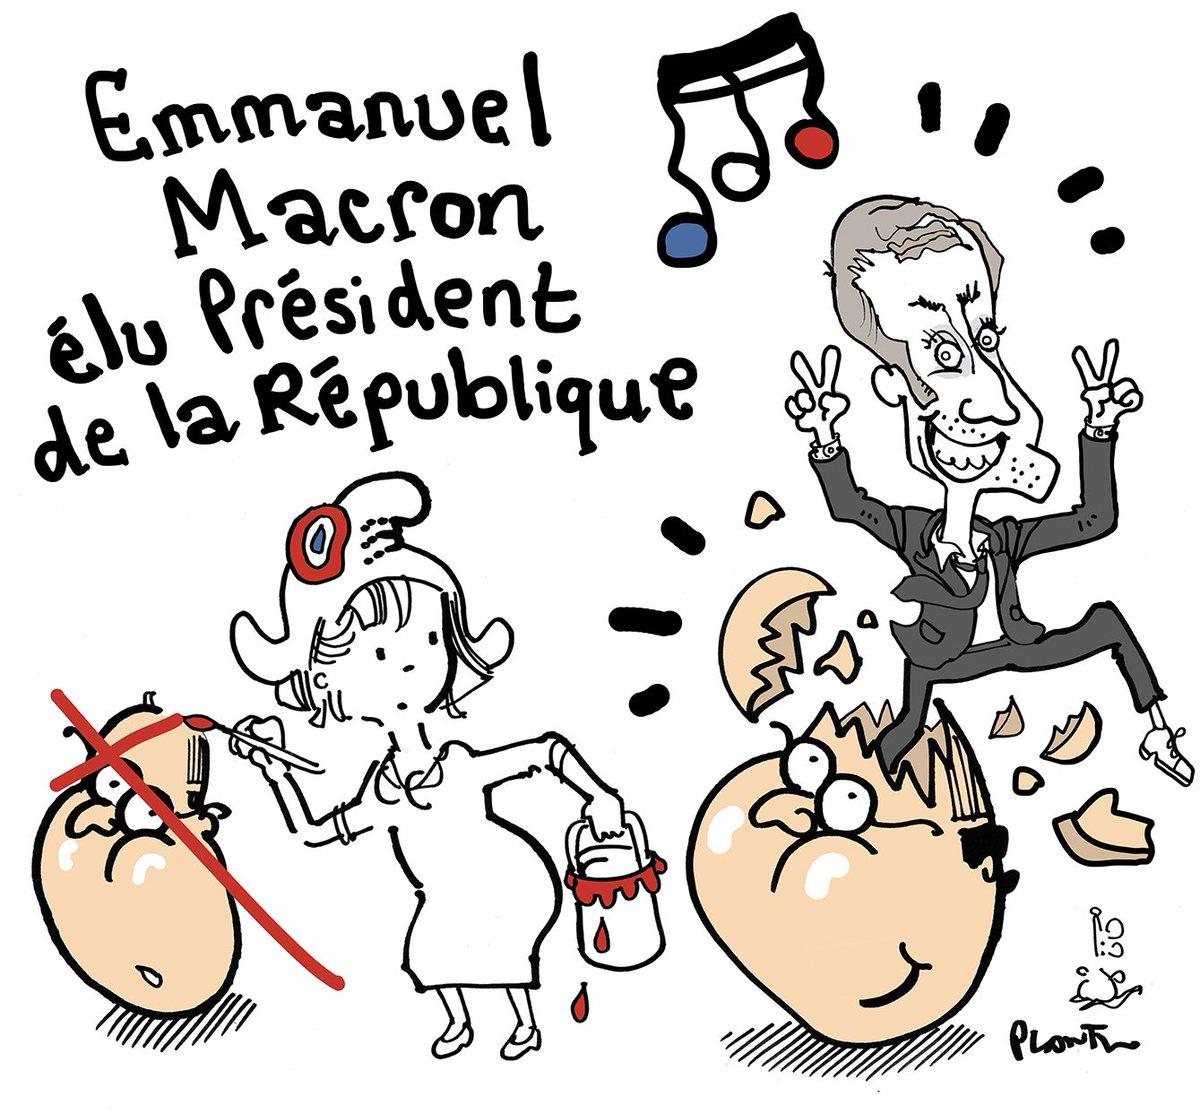 EMMANUEL MACRON ELU PRESIDENT DE LA REPUBLIQUE.